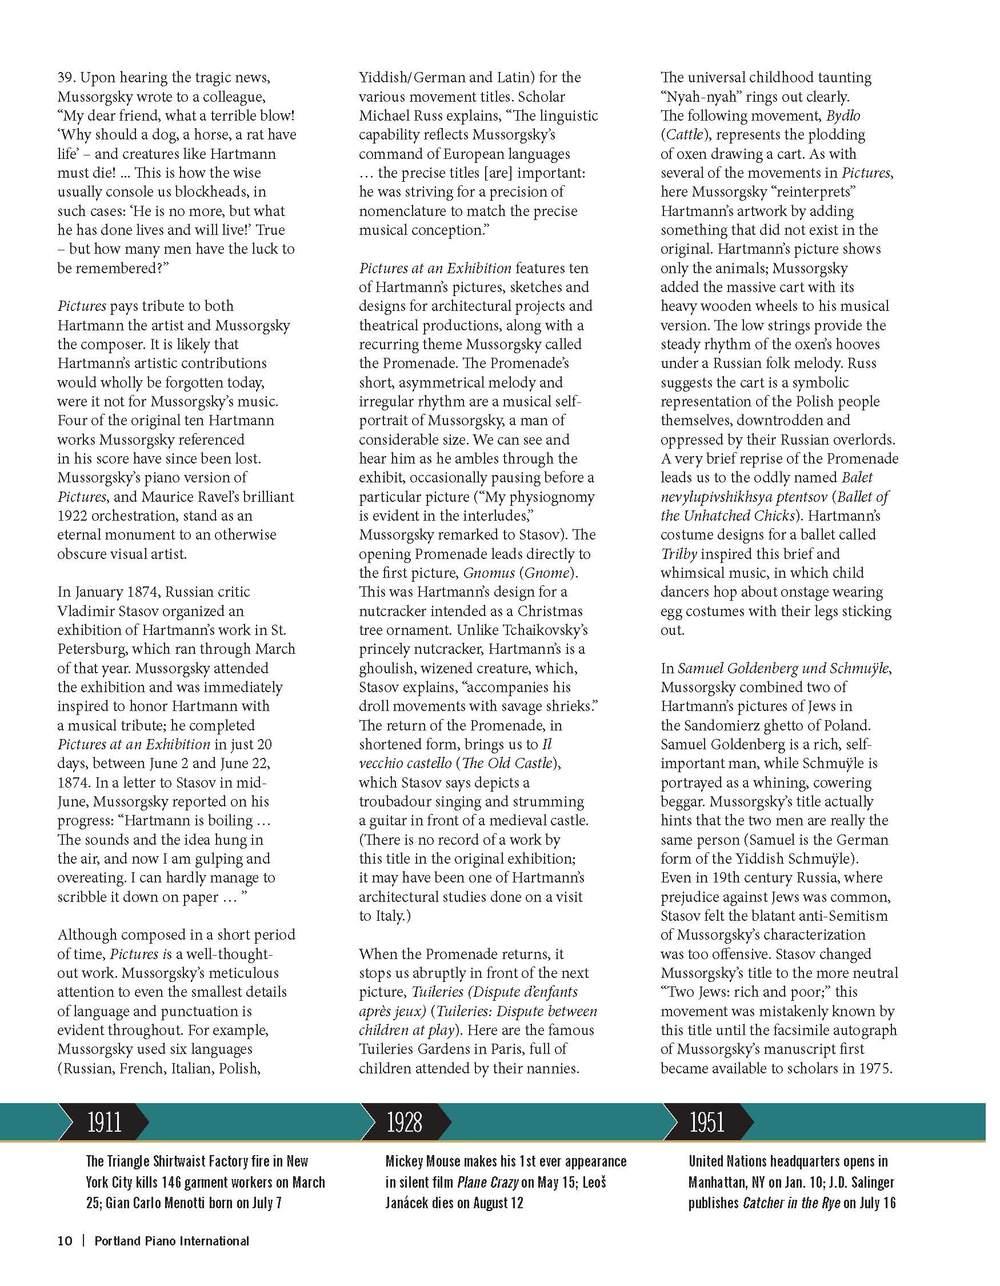 PPI_Program_Albright FINAL_Page_12.jpg